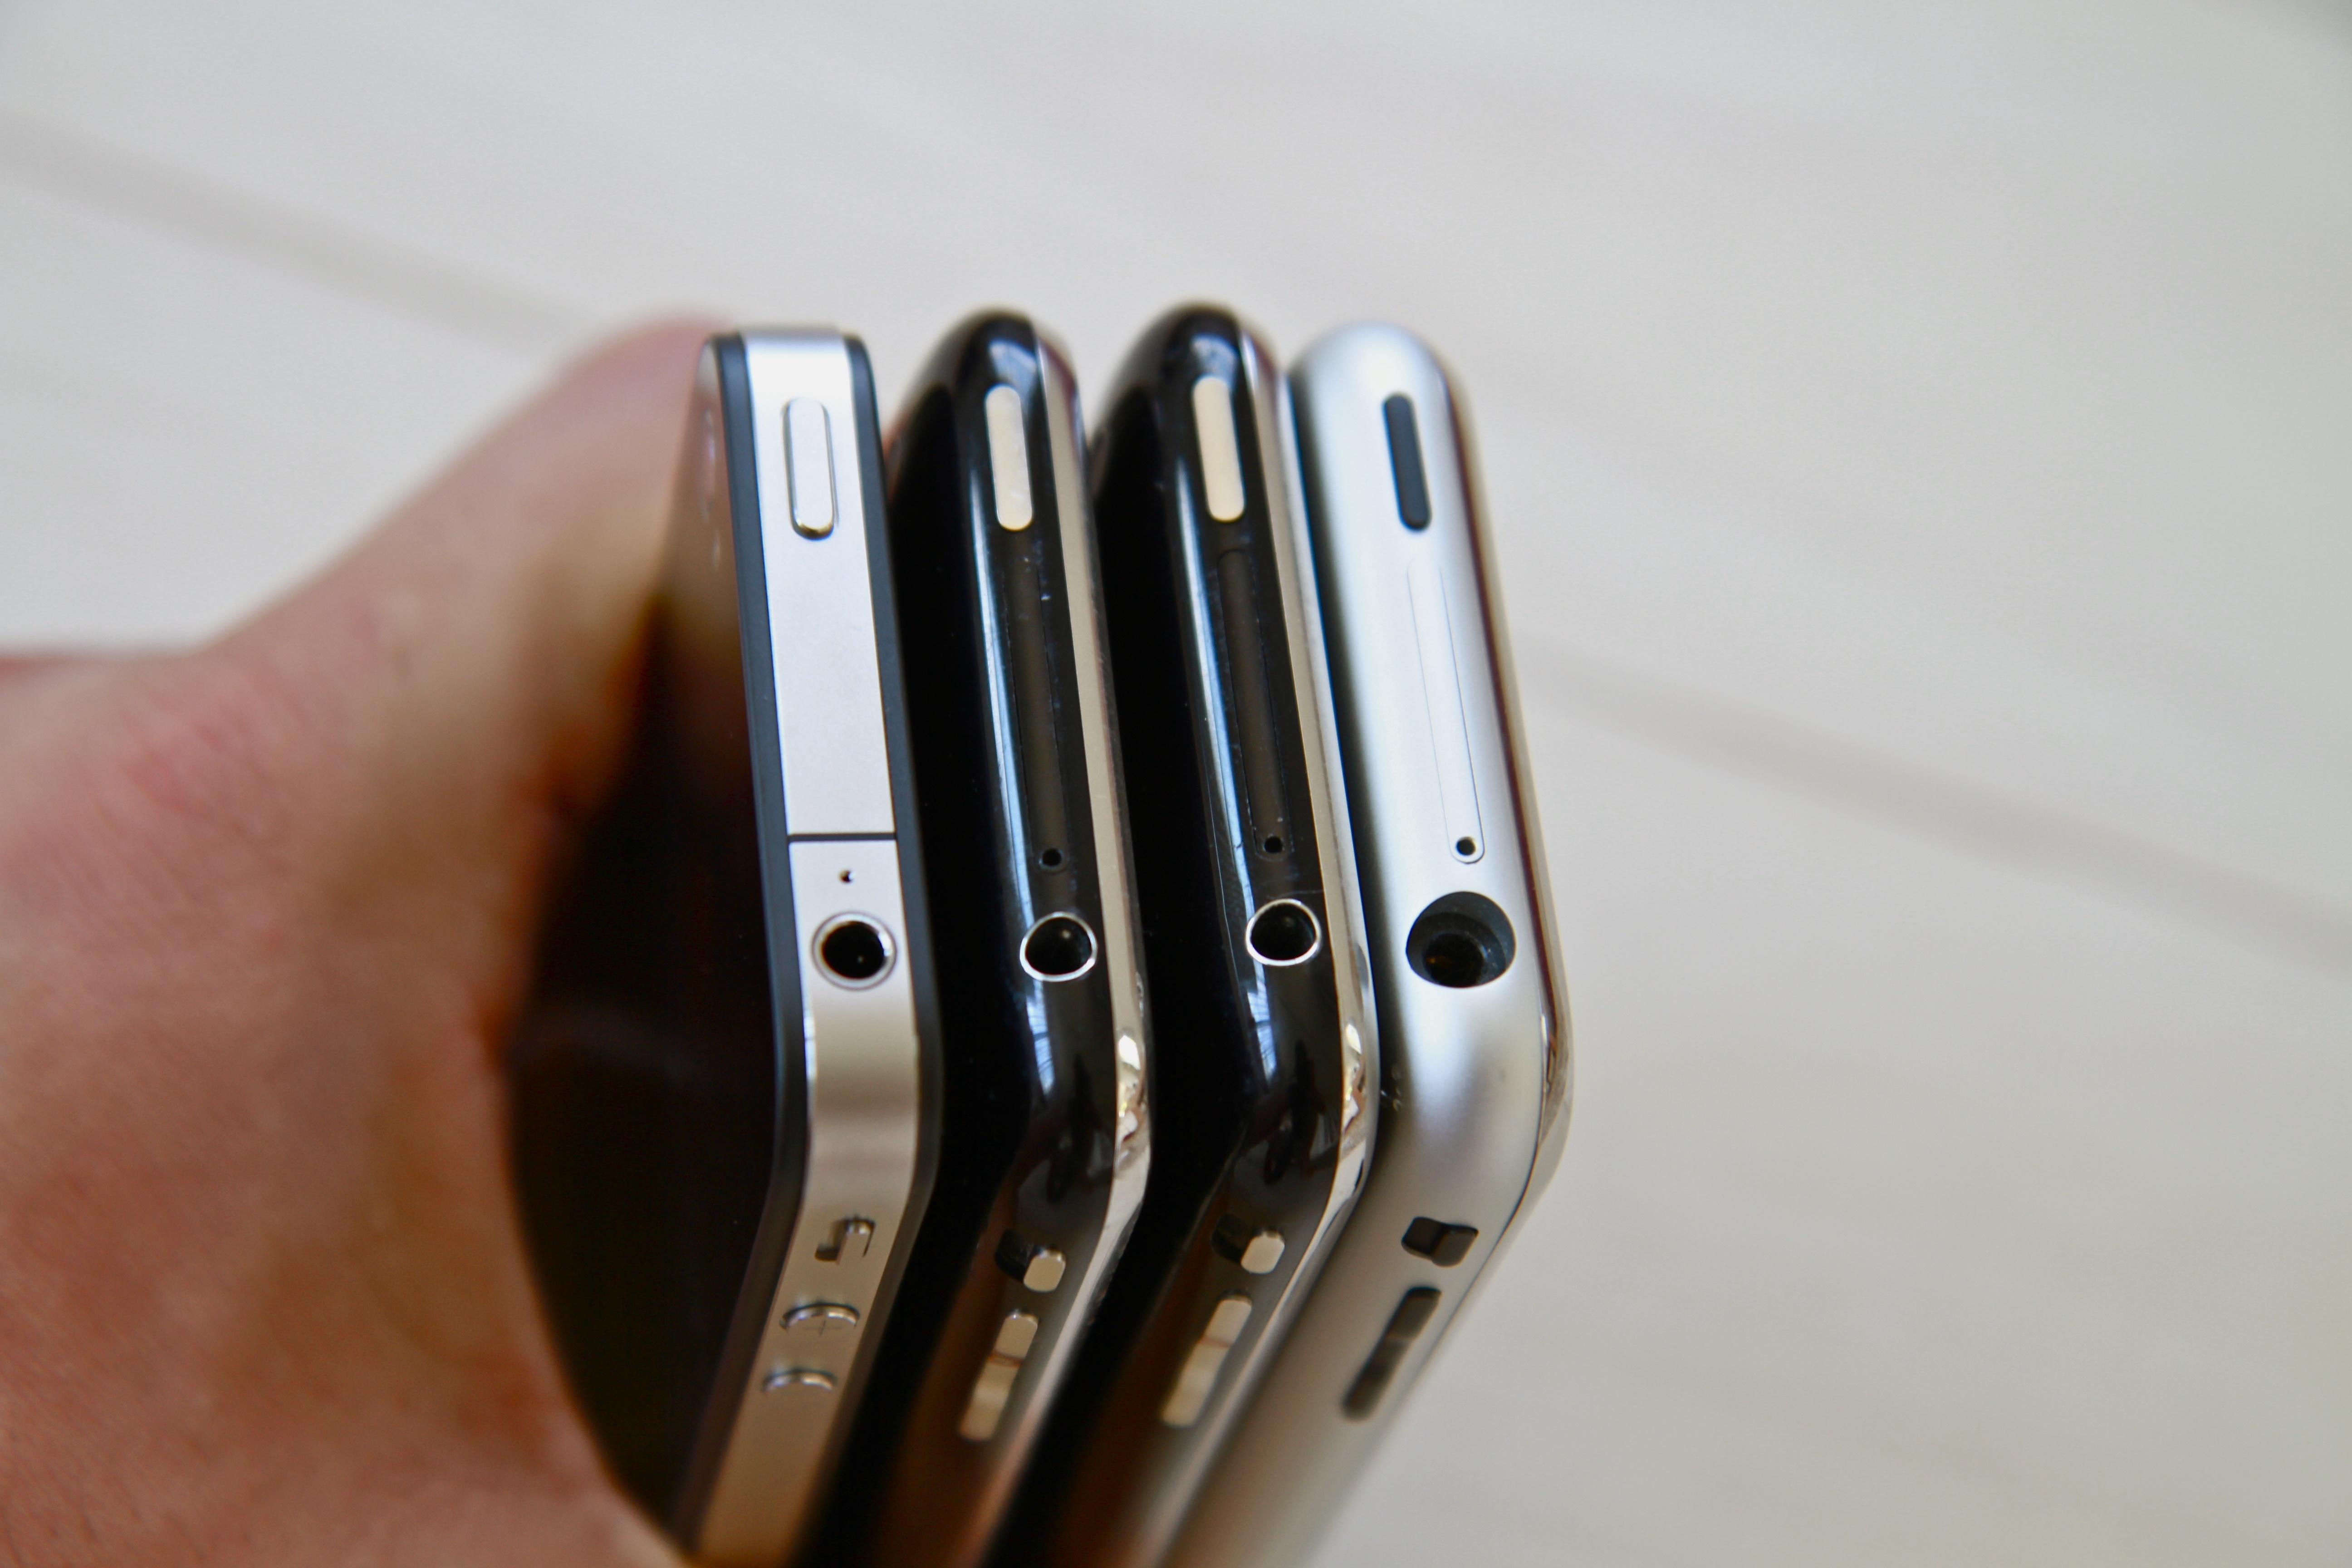 hand holding many smartphones